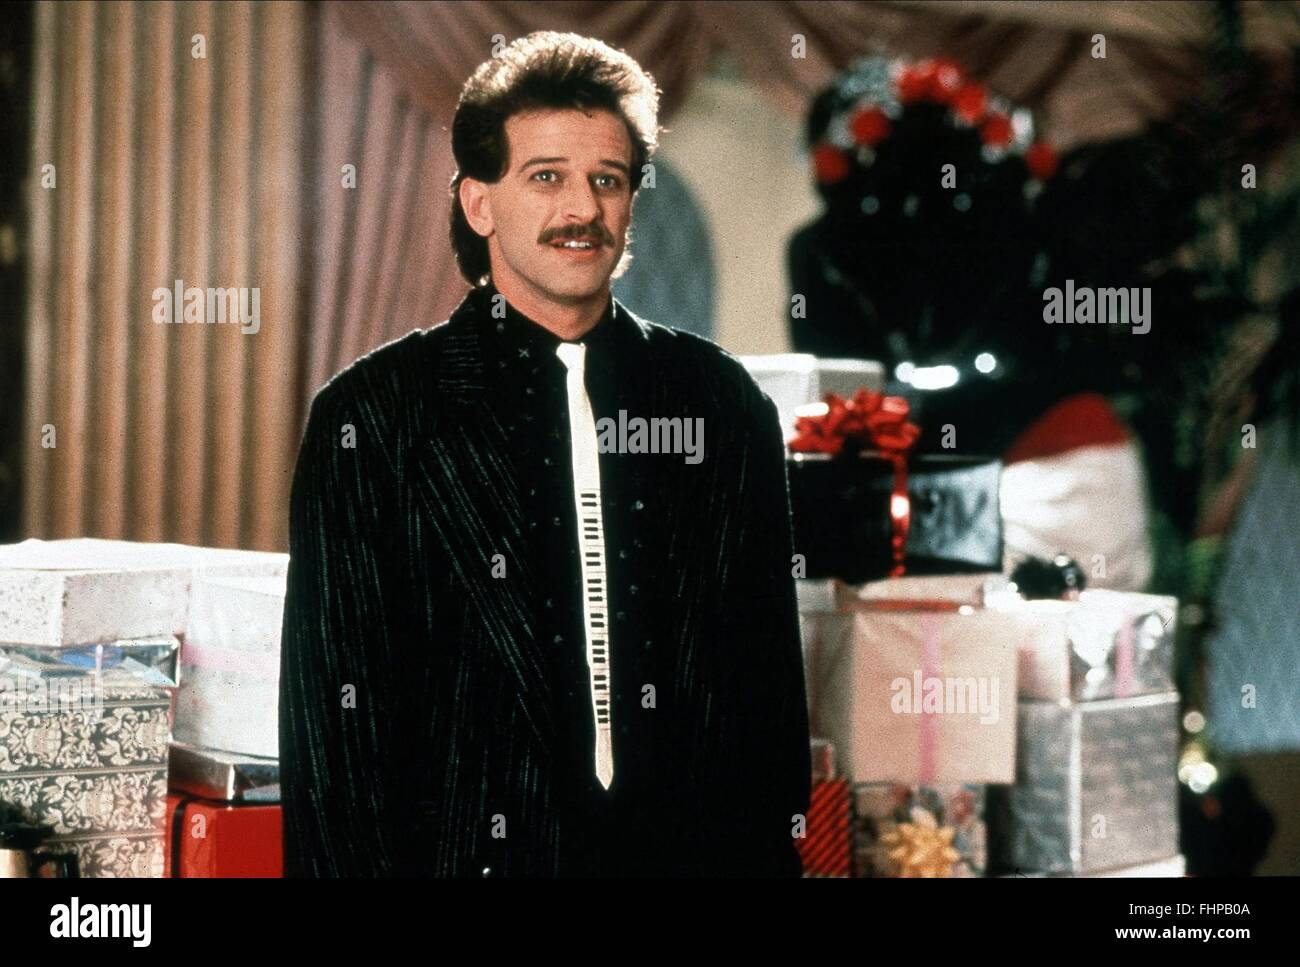 ALLEN COVERT THE WEDDING SINGER (1998 Stock Photo ...